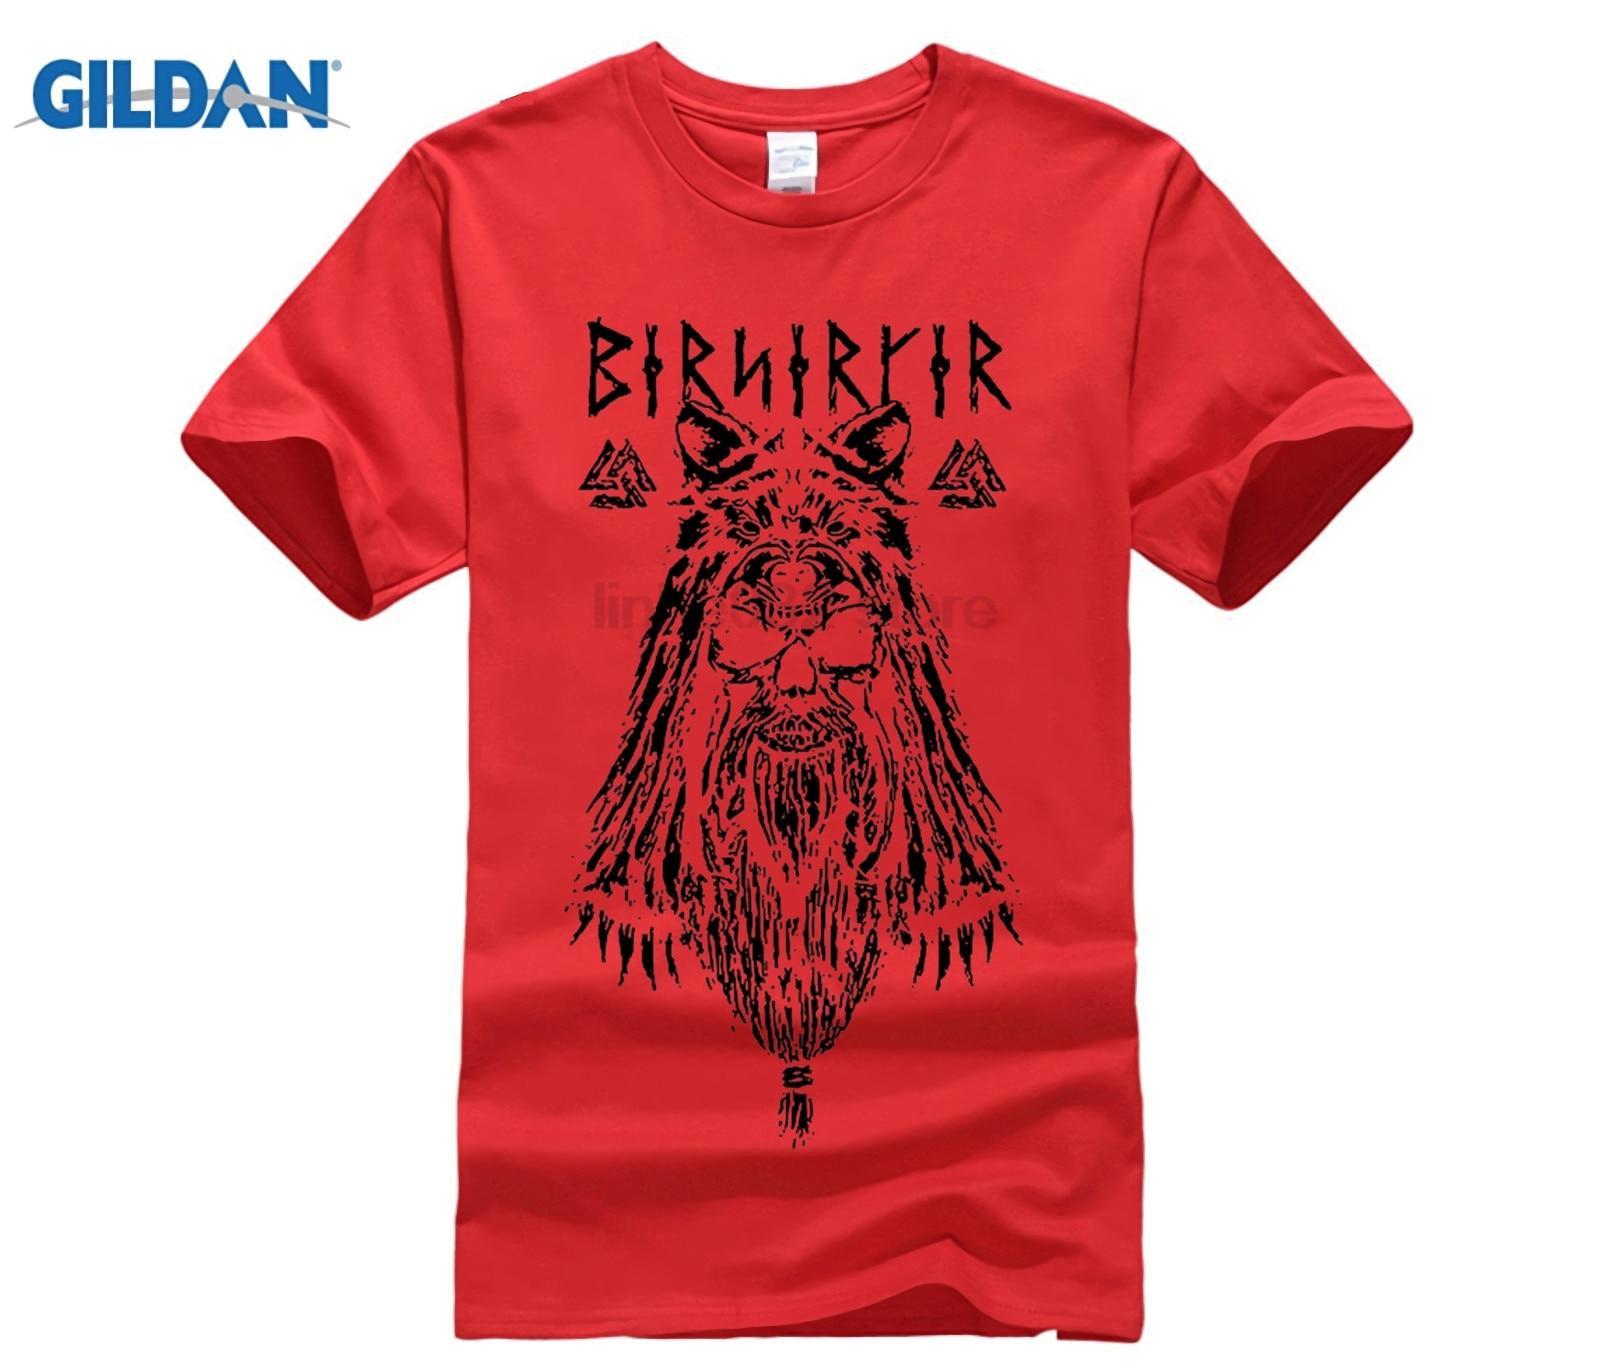 9a6160ca1 Viking Berserker Stylish T Shirts Men s Round Neck Short Sleeve Clothes New  Cotton Adult Tshirt Sales Tees Vikings Odin